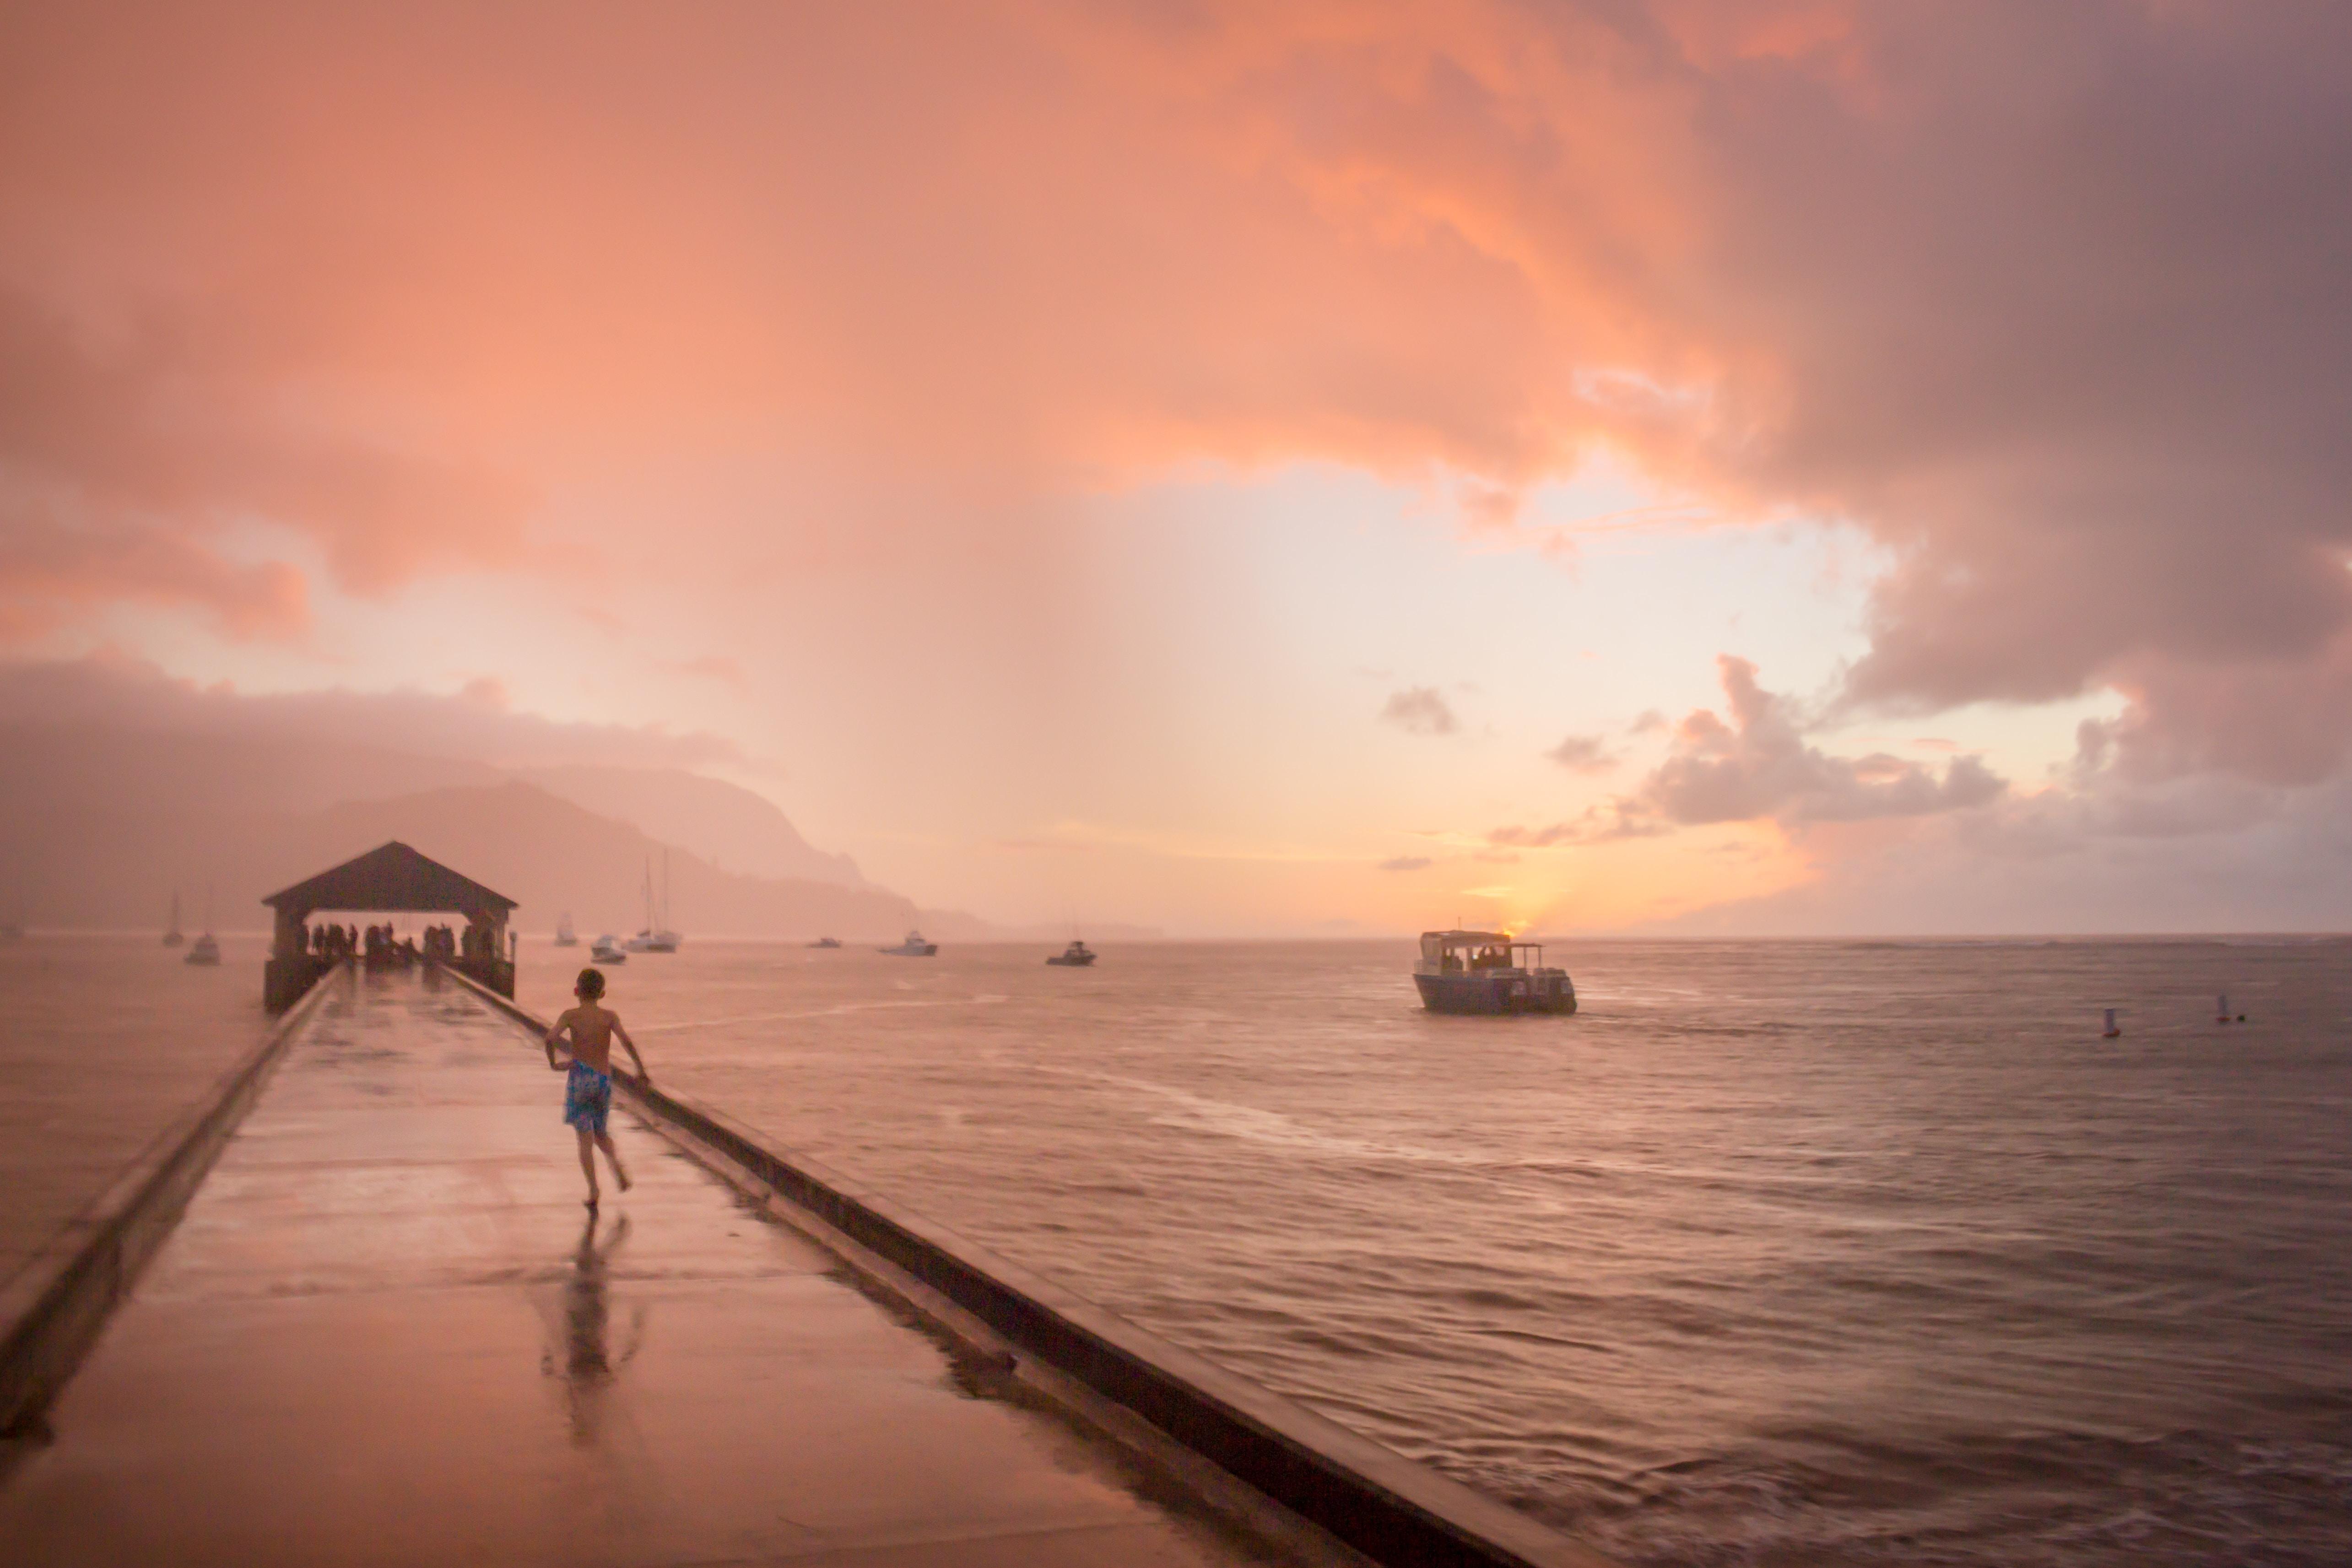 boy running on dock under cloudy sky